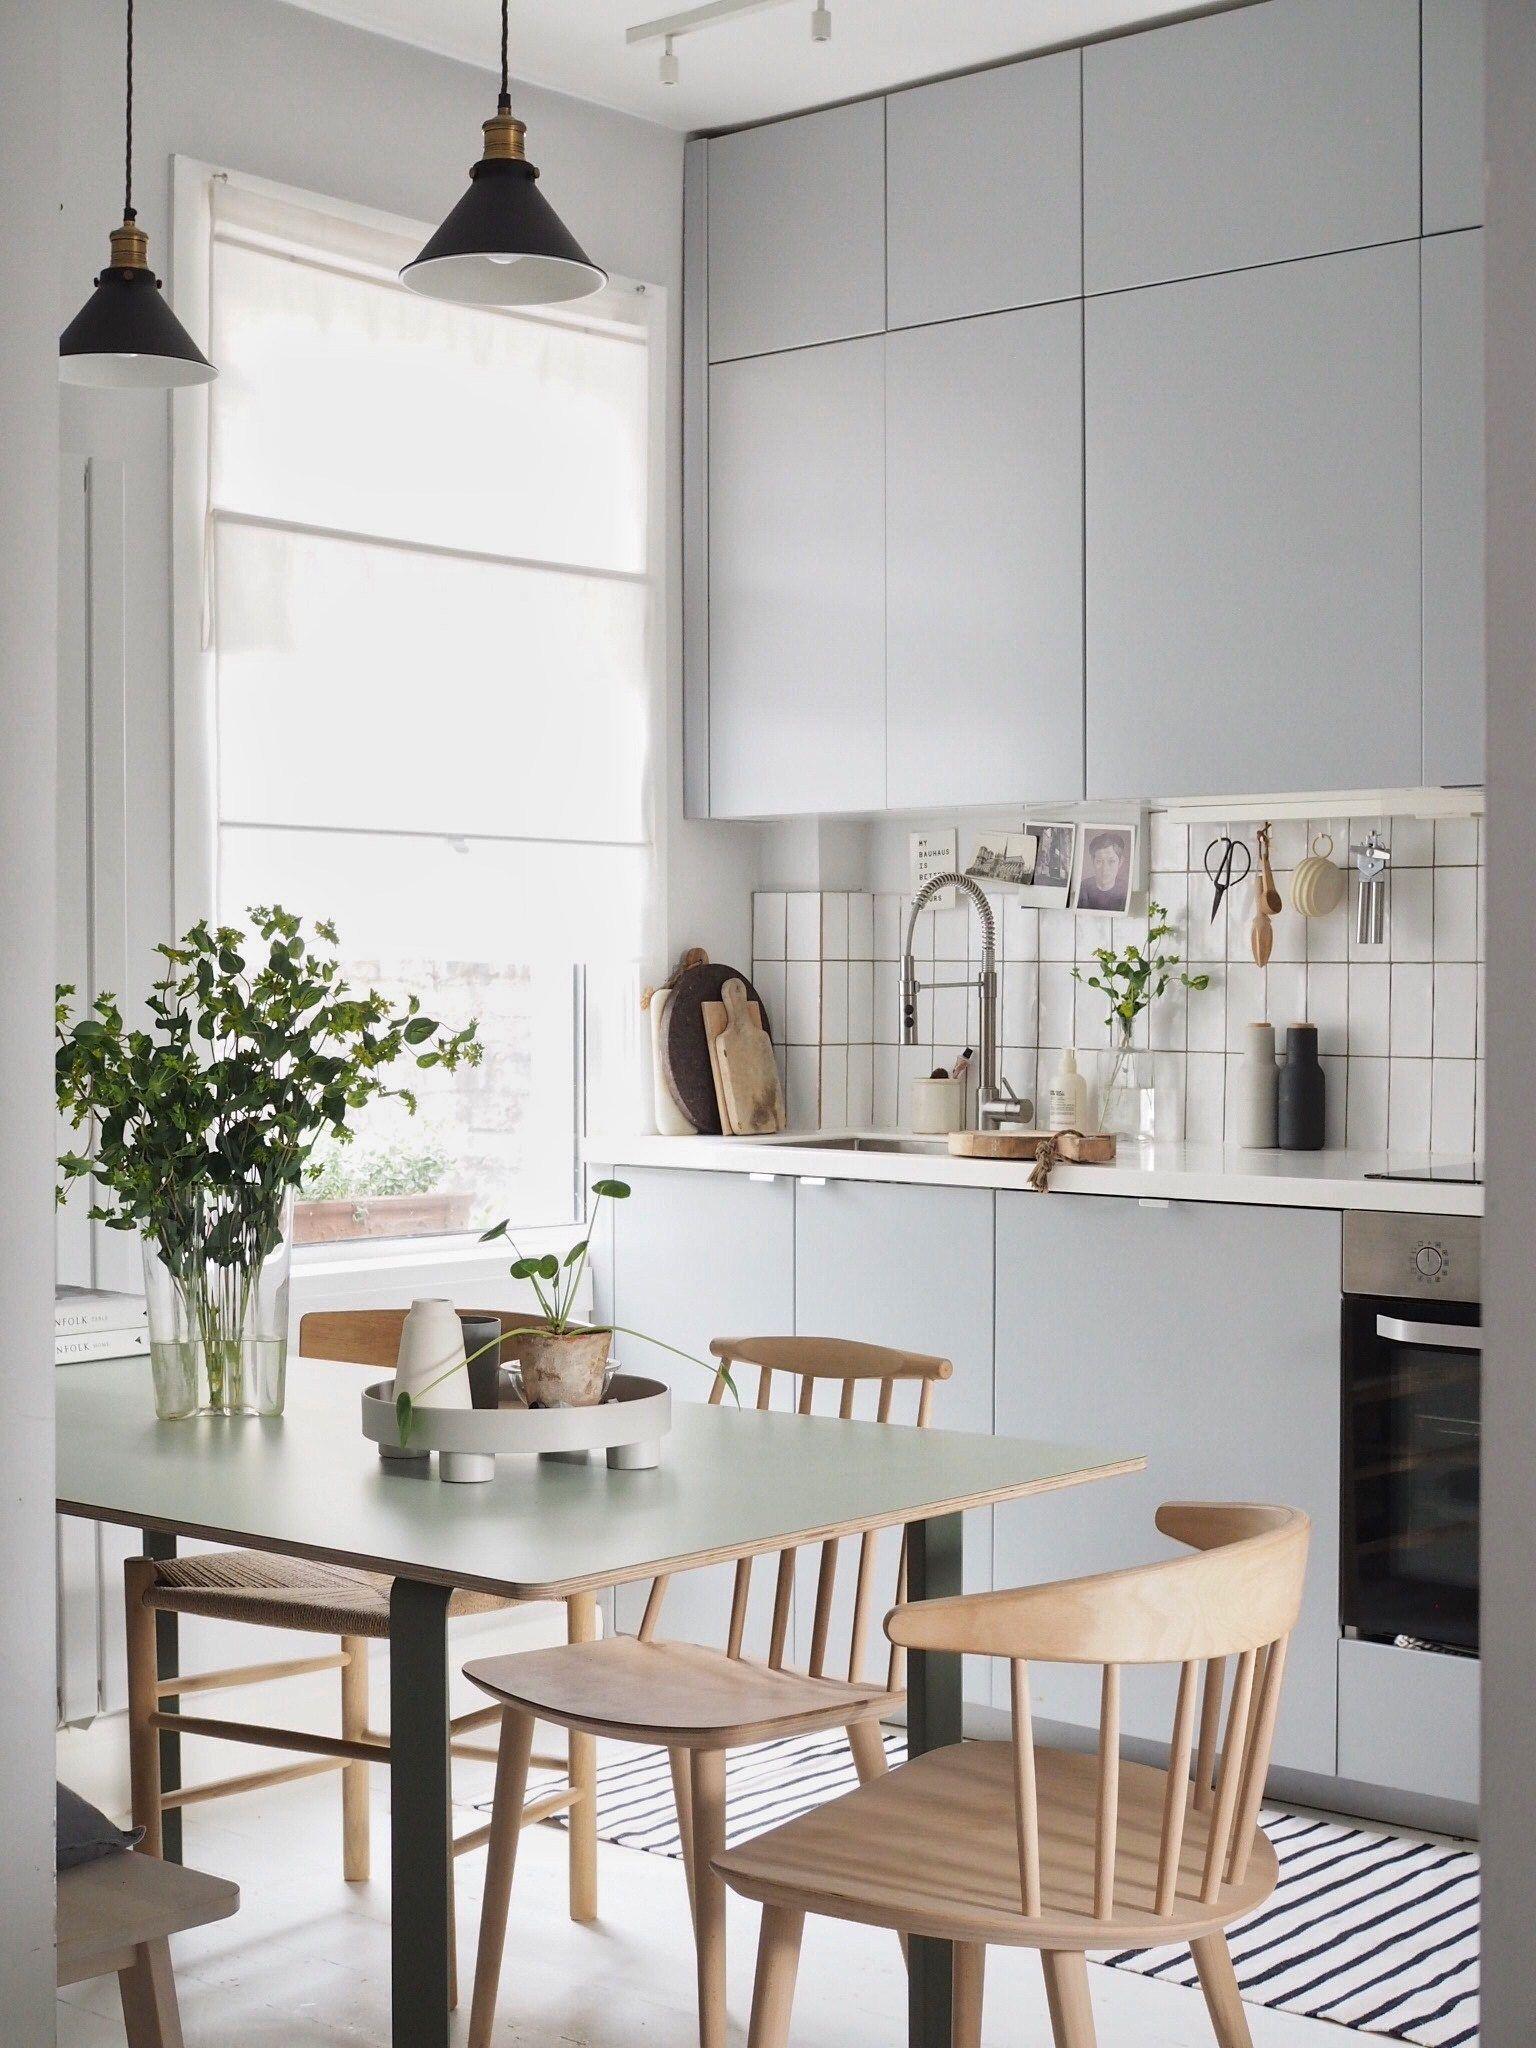 Inside My Home Scandinavian Kitchen Design Simple Interior Design Interior Design Kitchen